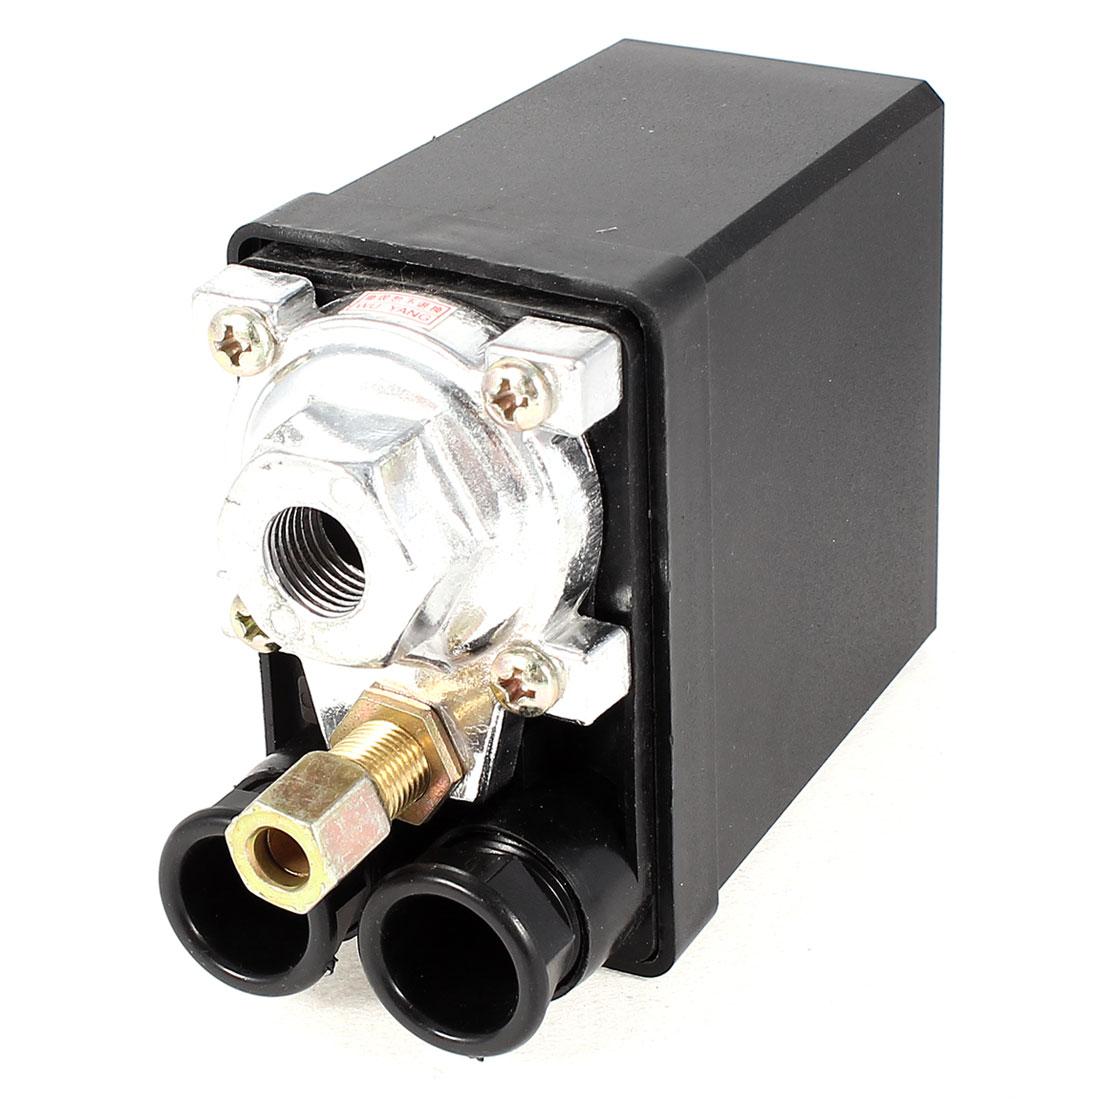 Air Compressor Pressure Switch Control Valve AC 220V 20A 175PSI 1 Port